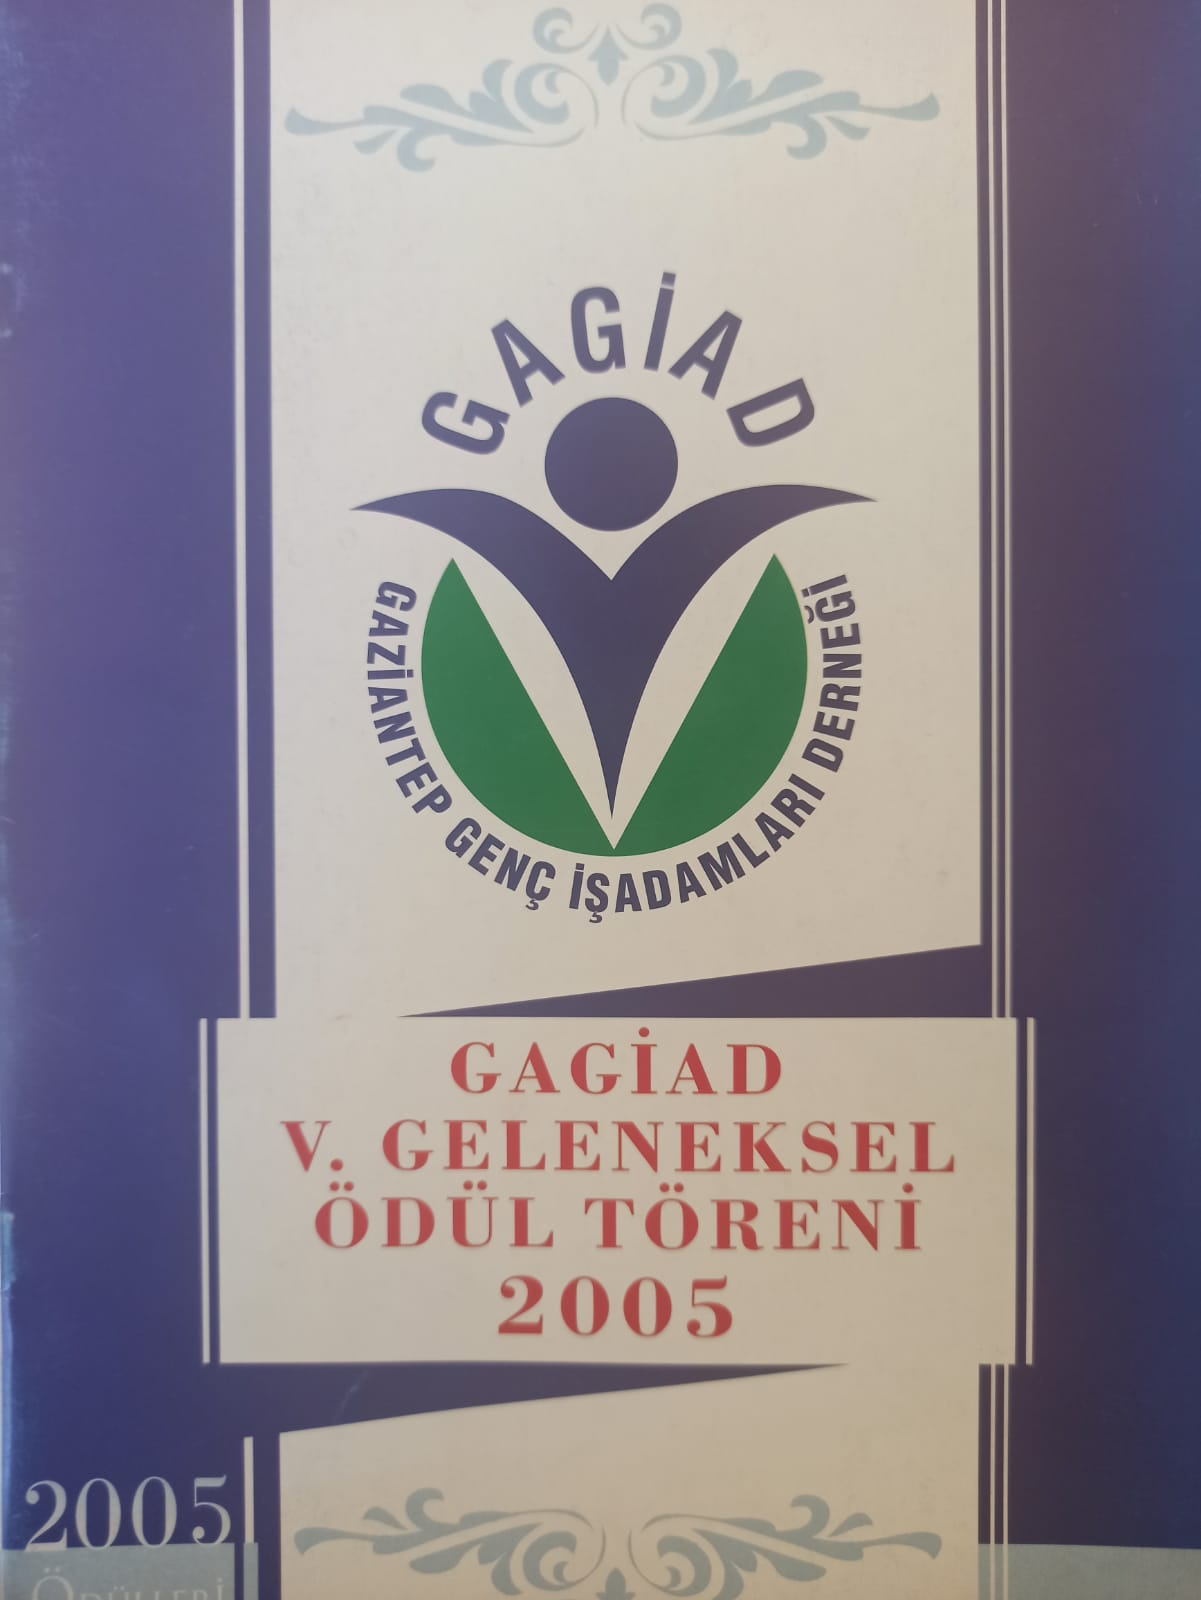 GAGİAD V. GELENEKSEL ÖDÜL TÖRENİ